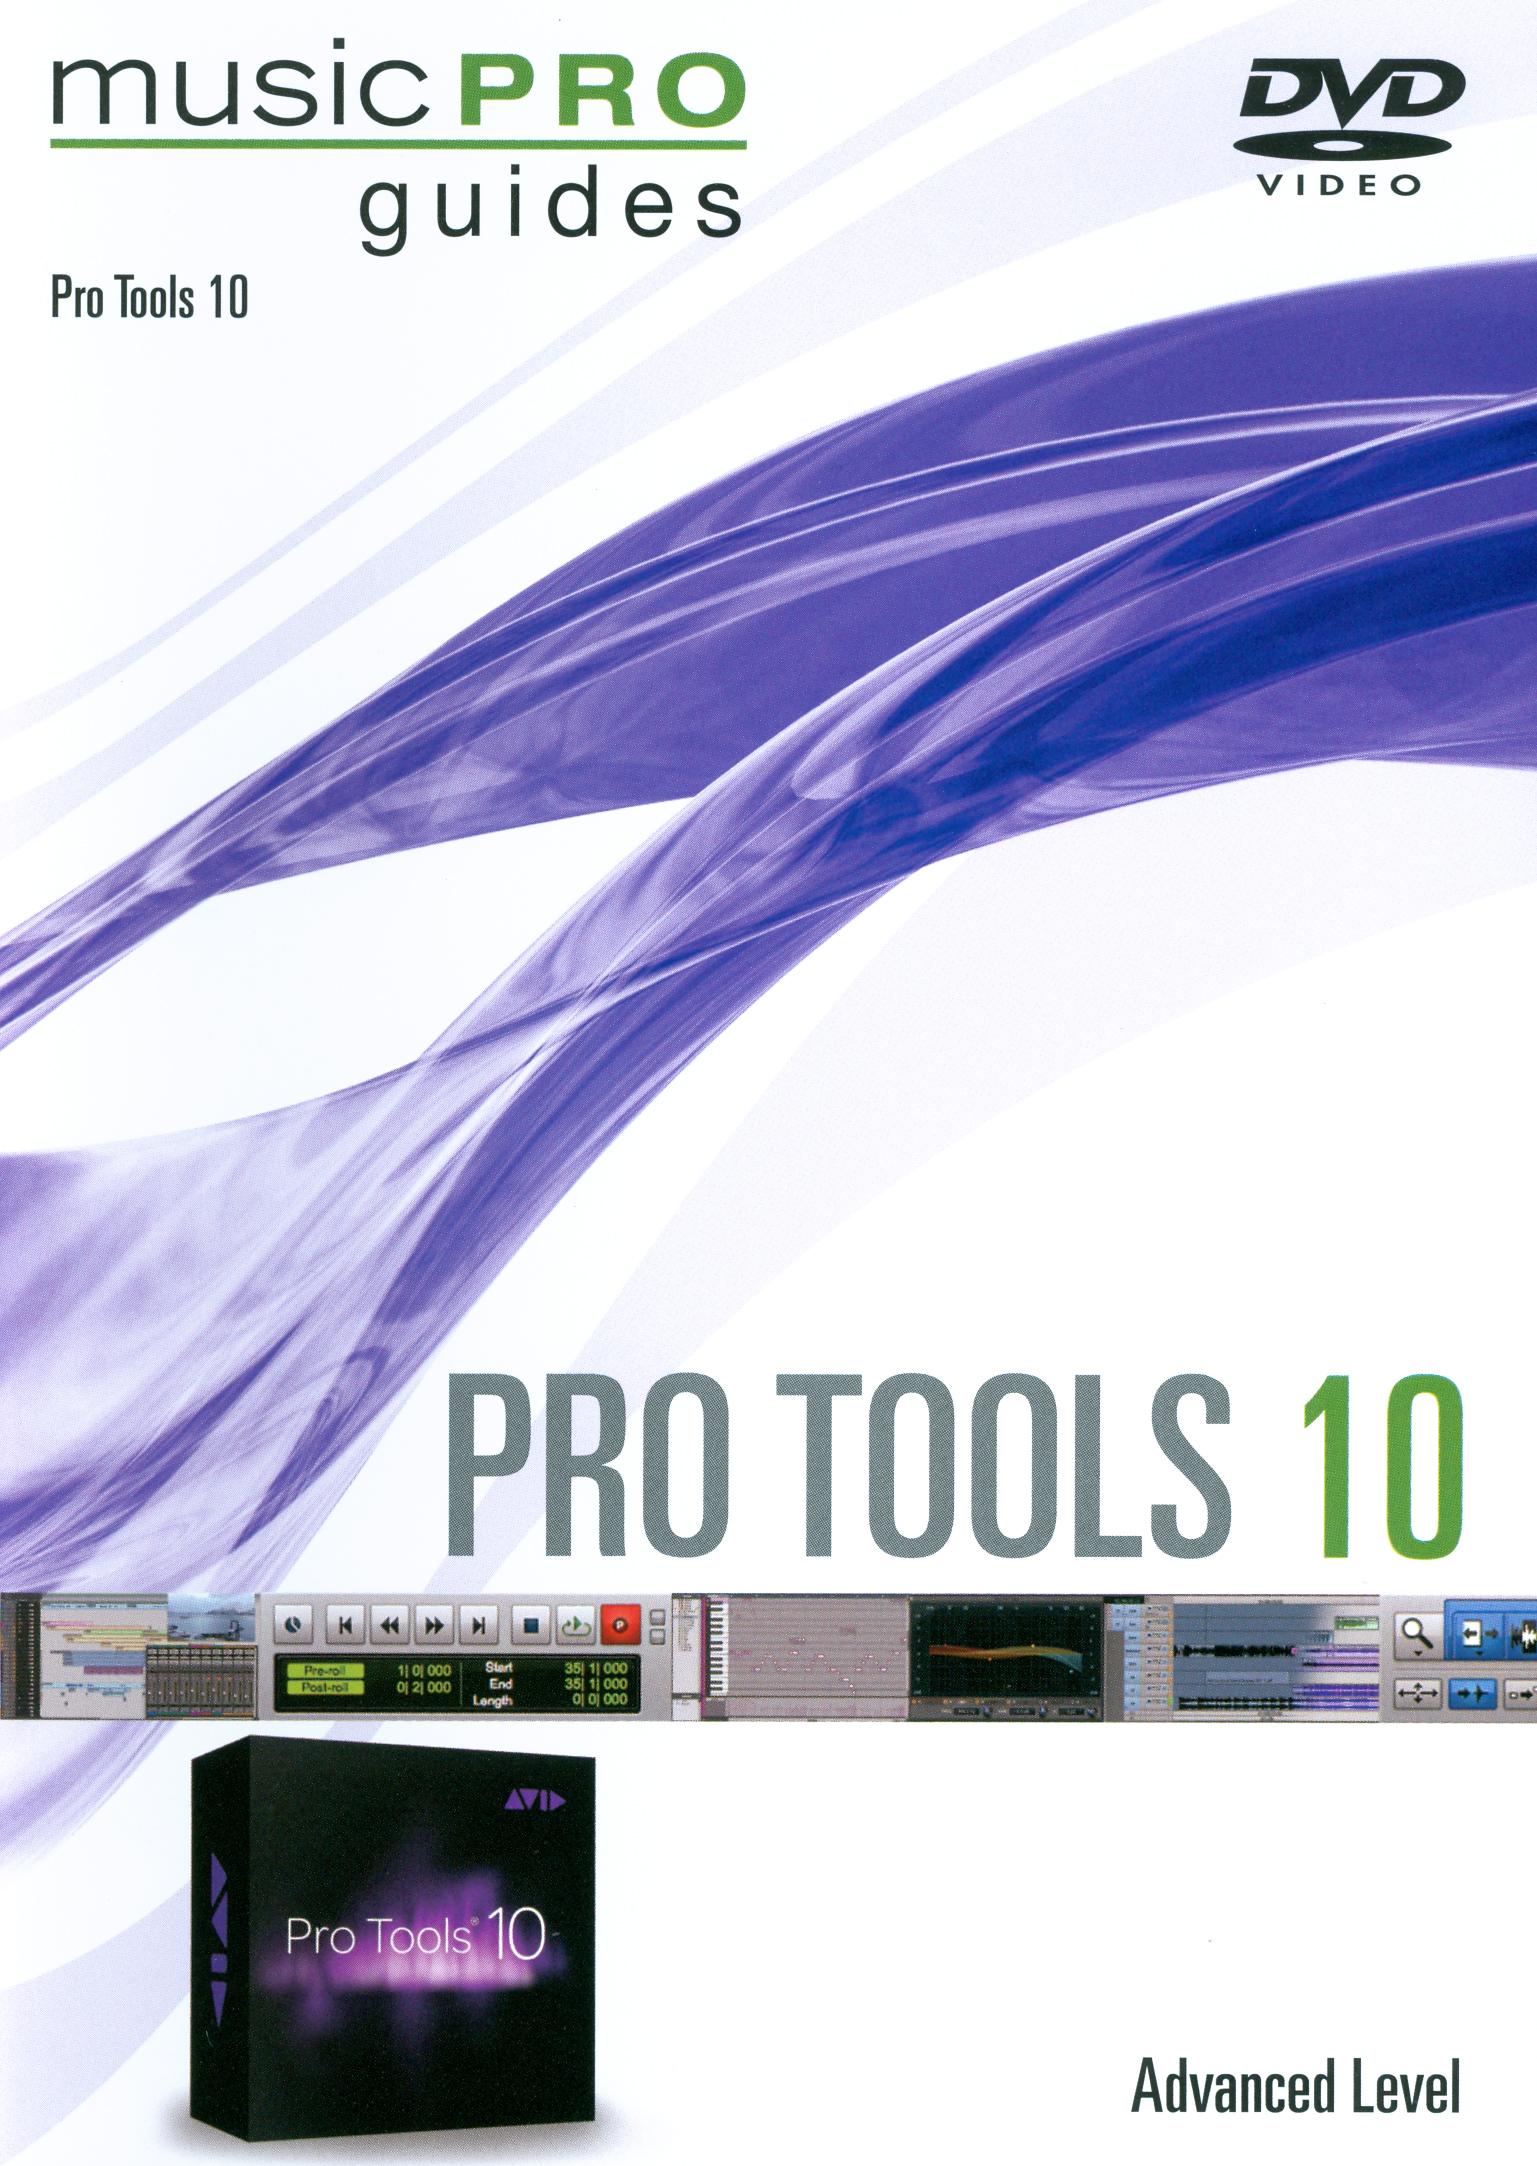 Pro Tools 10: Advanced Level